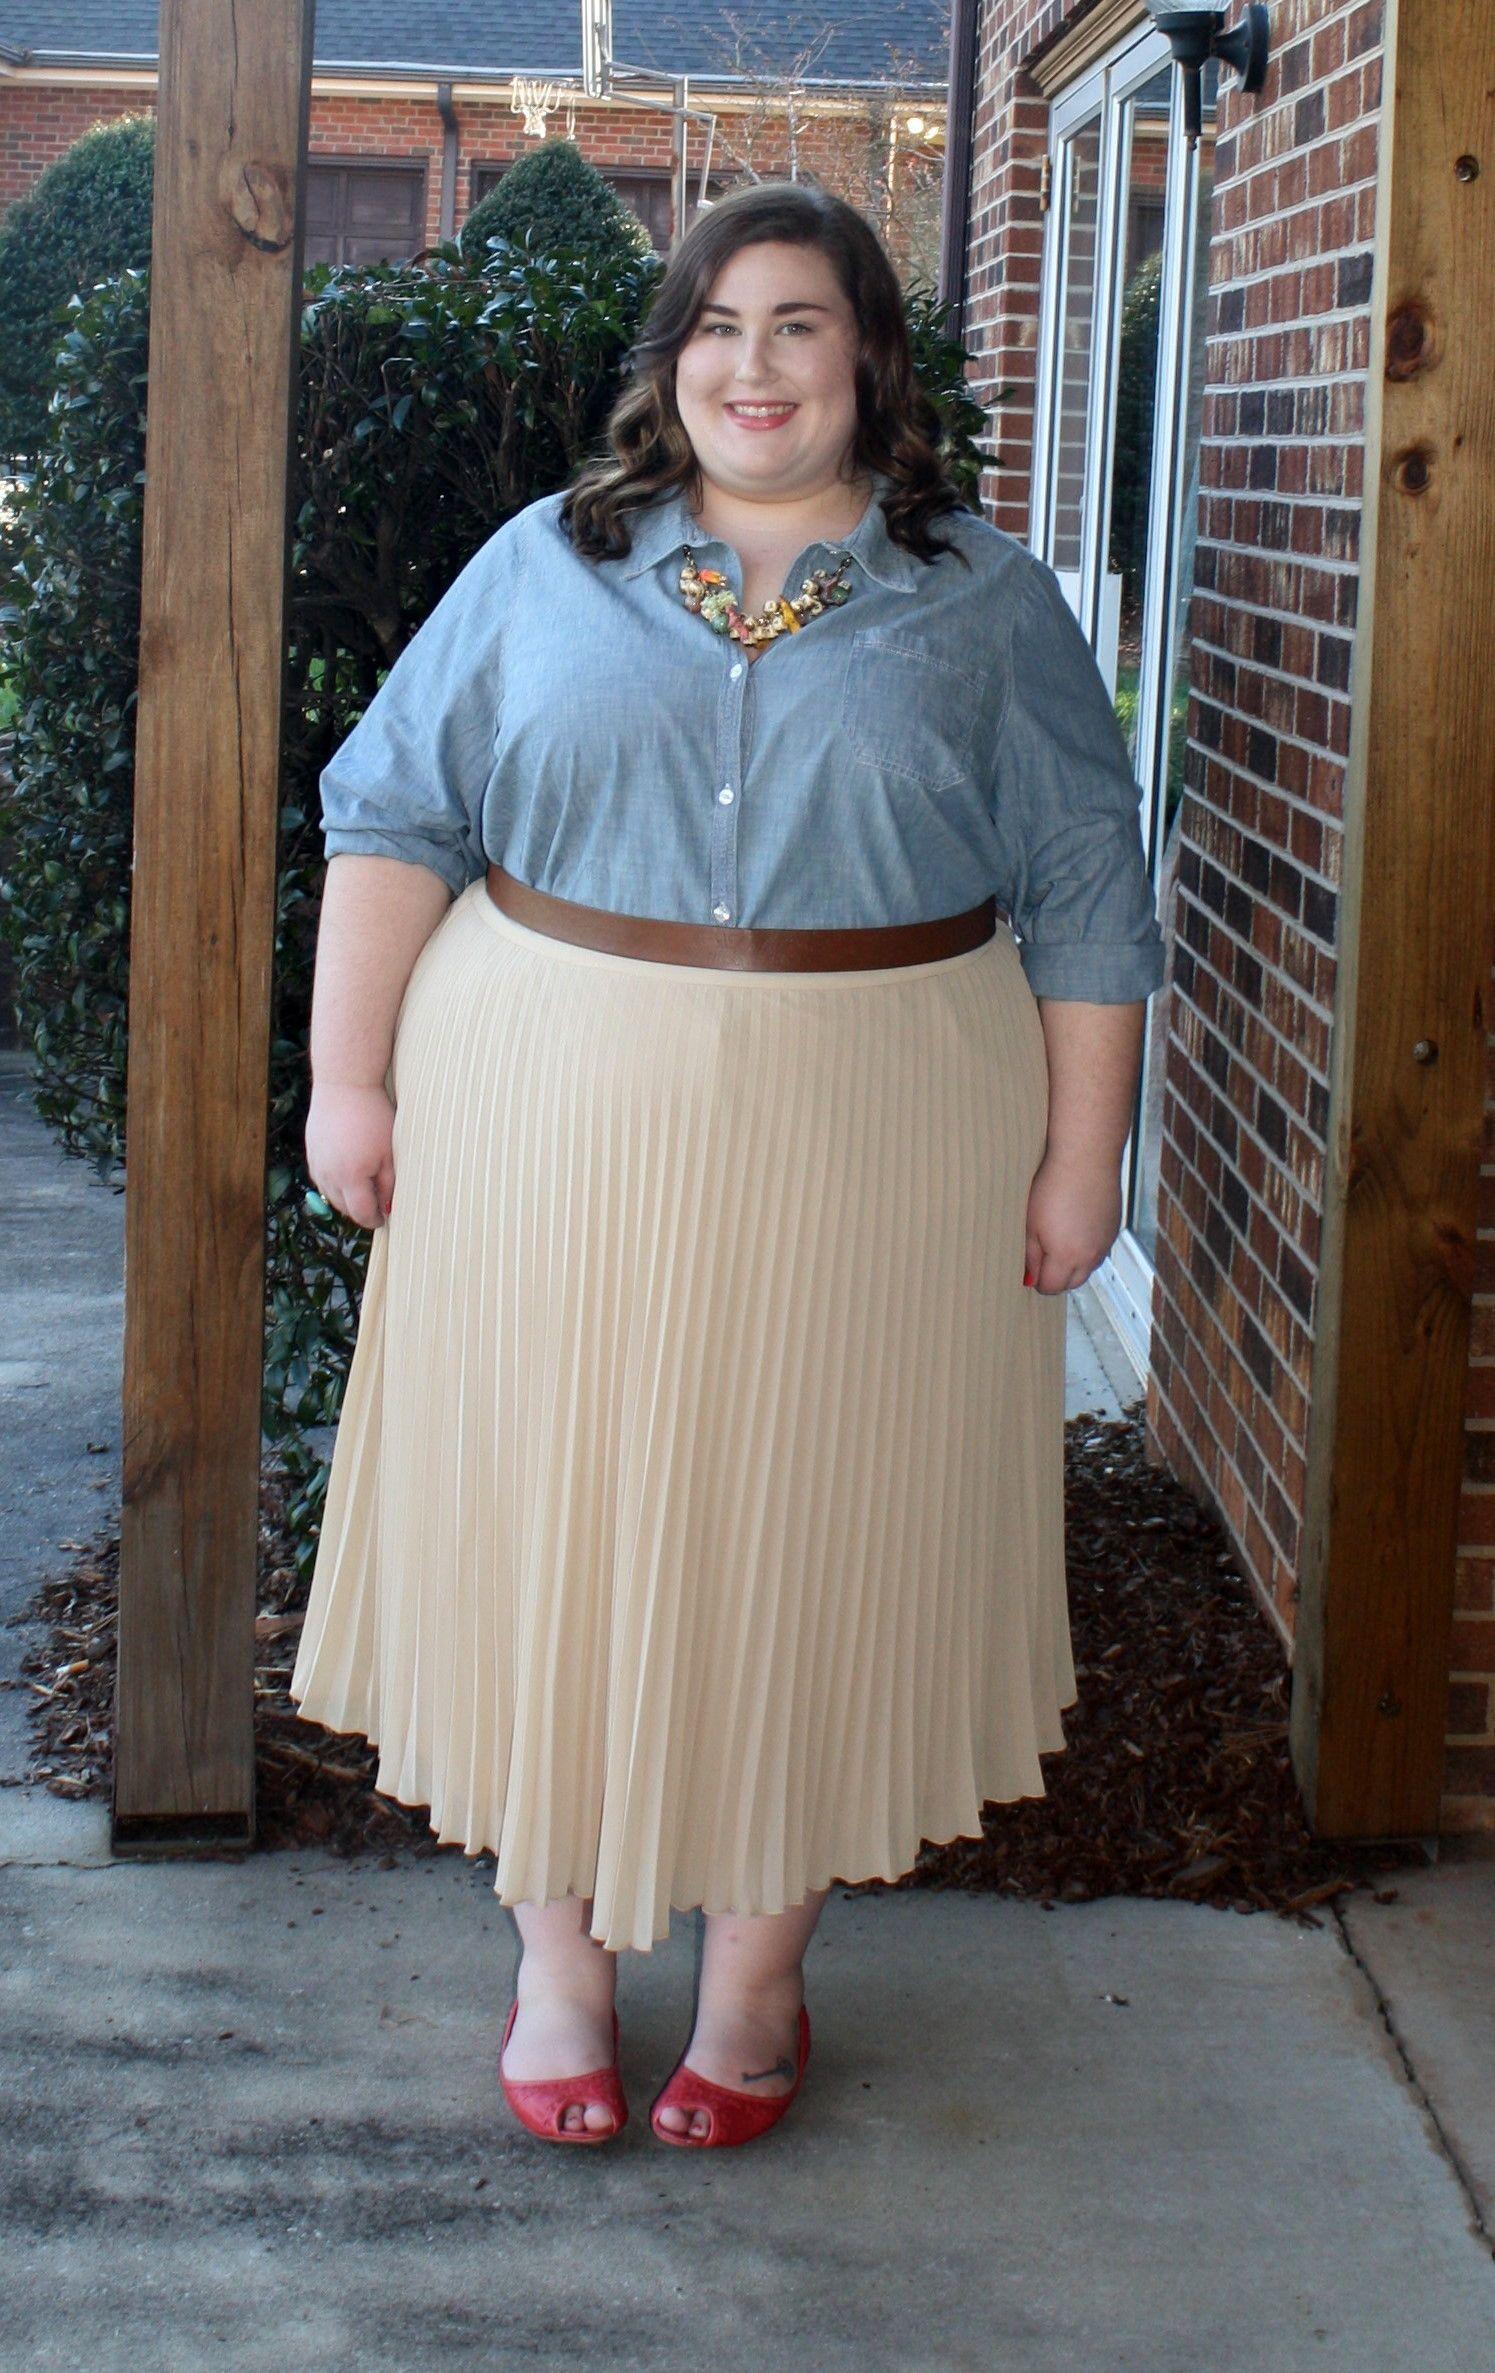 khaki skirt | Fit | Pinterest | Khaki skirt and Khakis